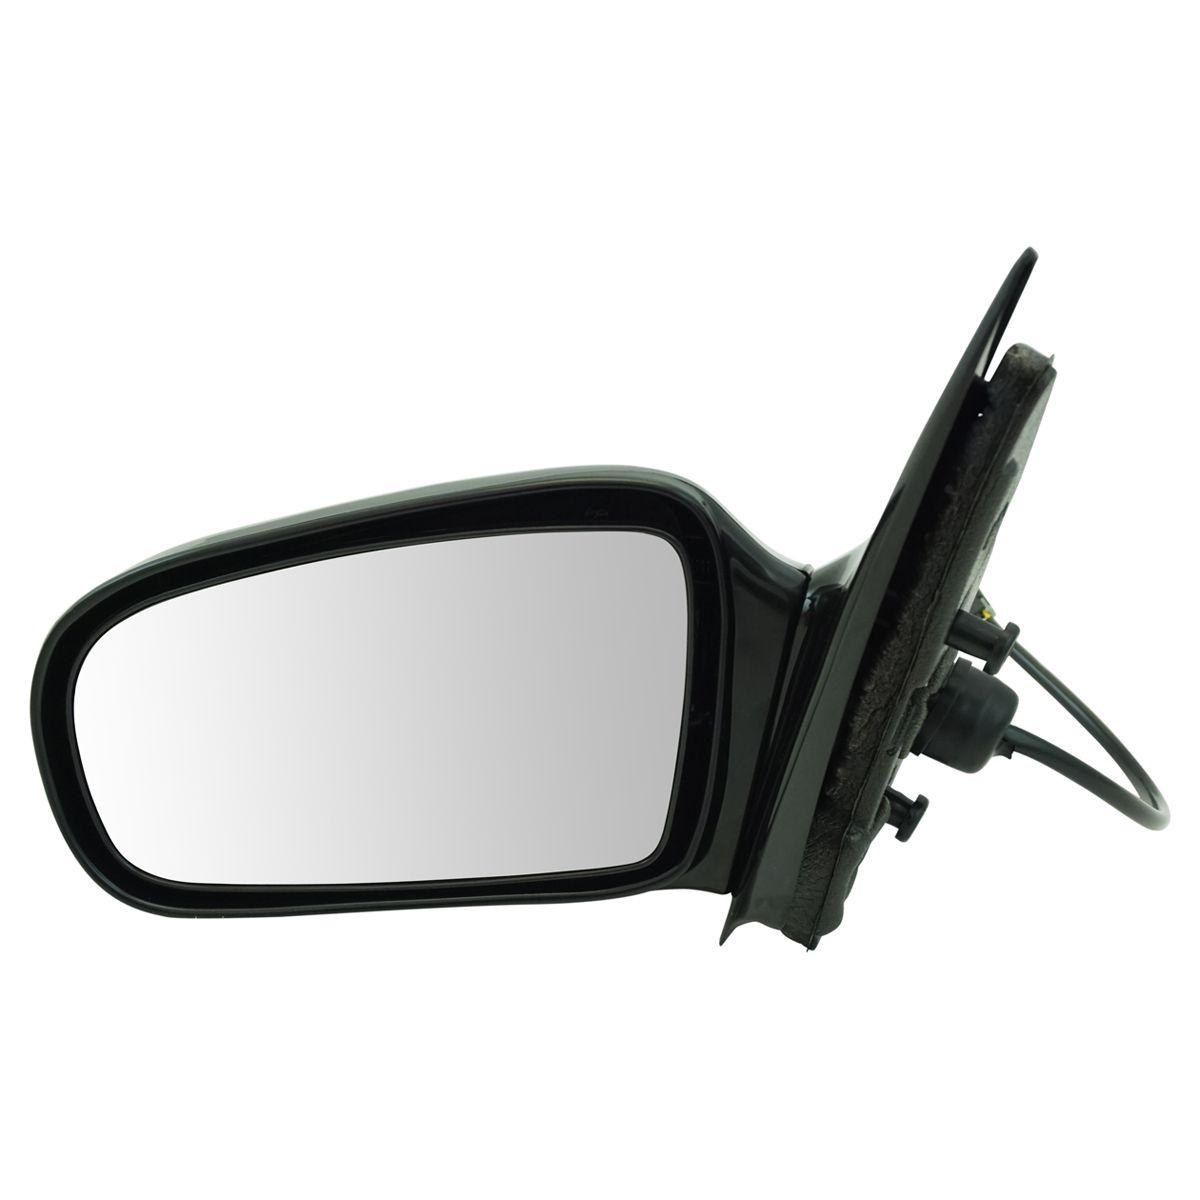 Manual Remote Side View Mirror Driver Left LH for 95-05 Cavalier Sunfire Sedan